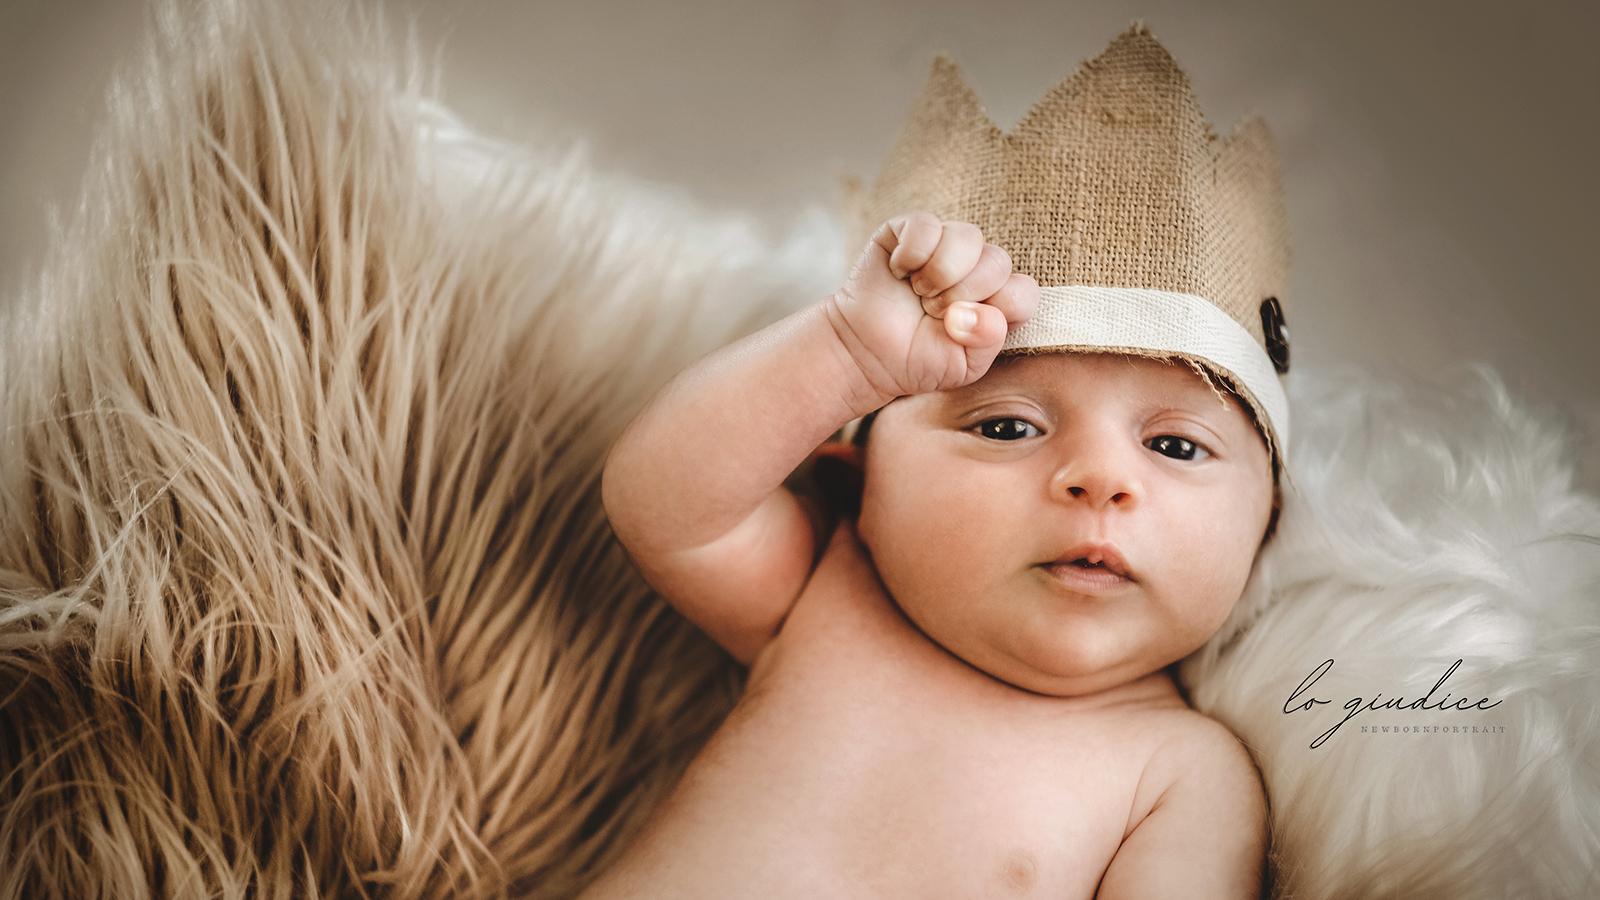 foto bambino con corona